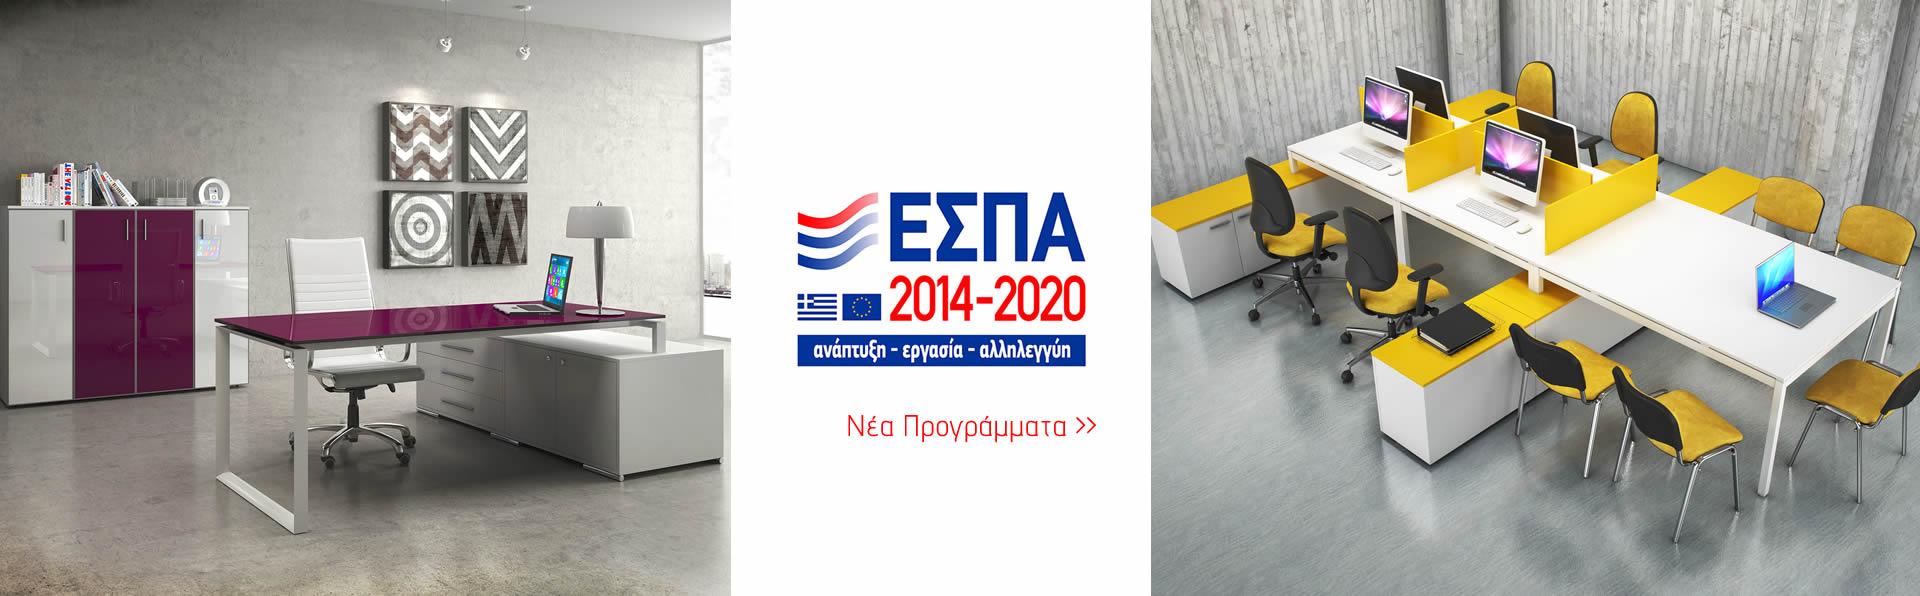 ed9dab6762a Αρχικη - Sigma Office - Έπιπλα & καρέκλες γραφείου. Ιματιοθήκες ...